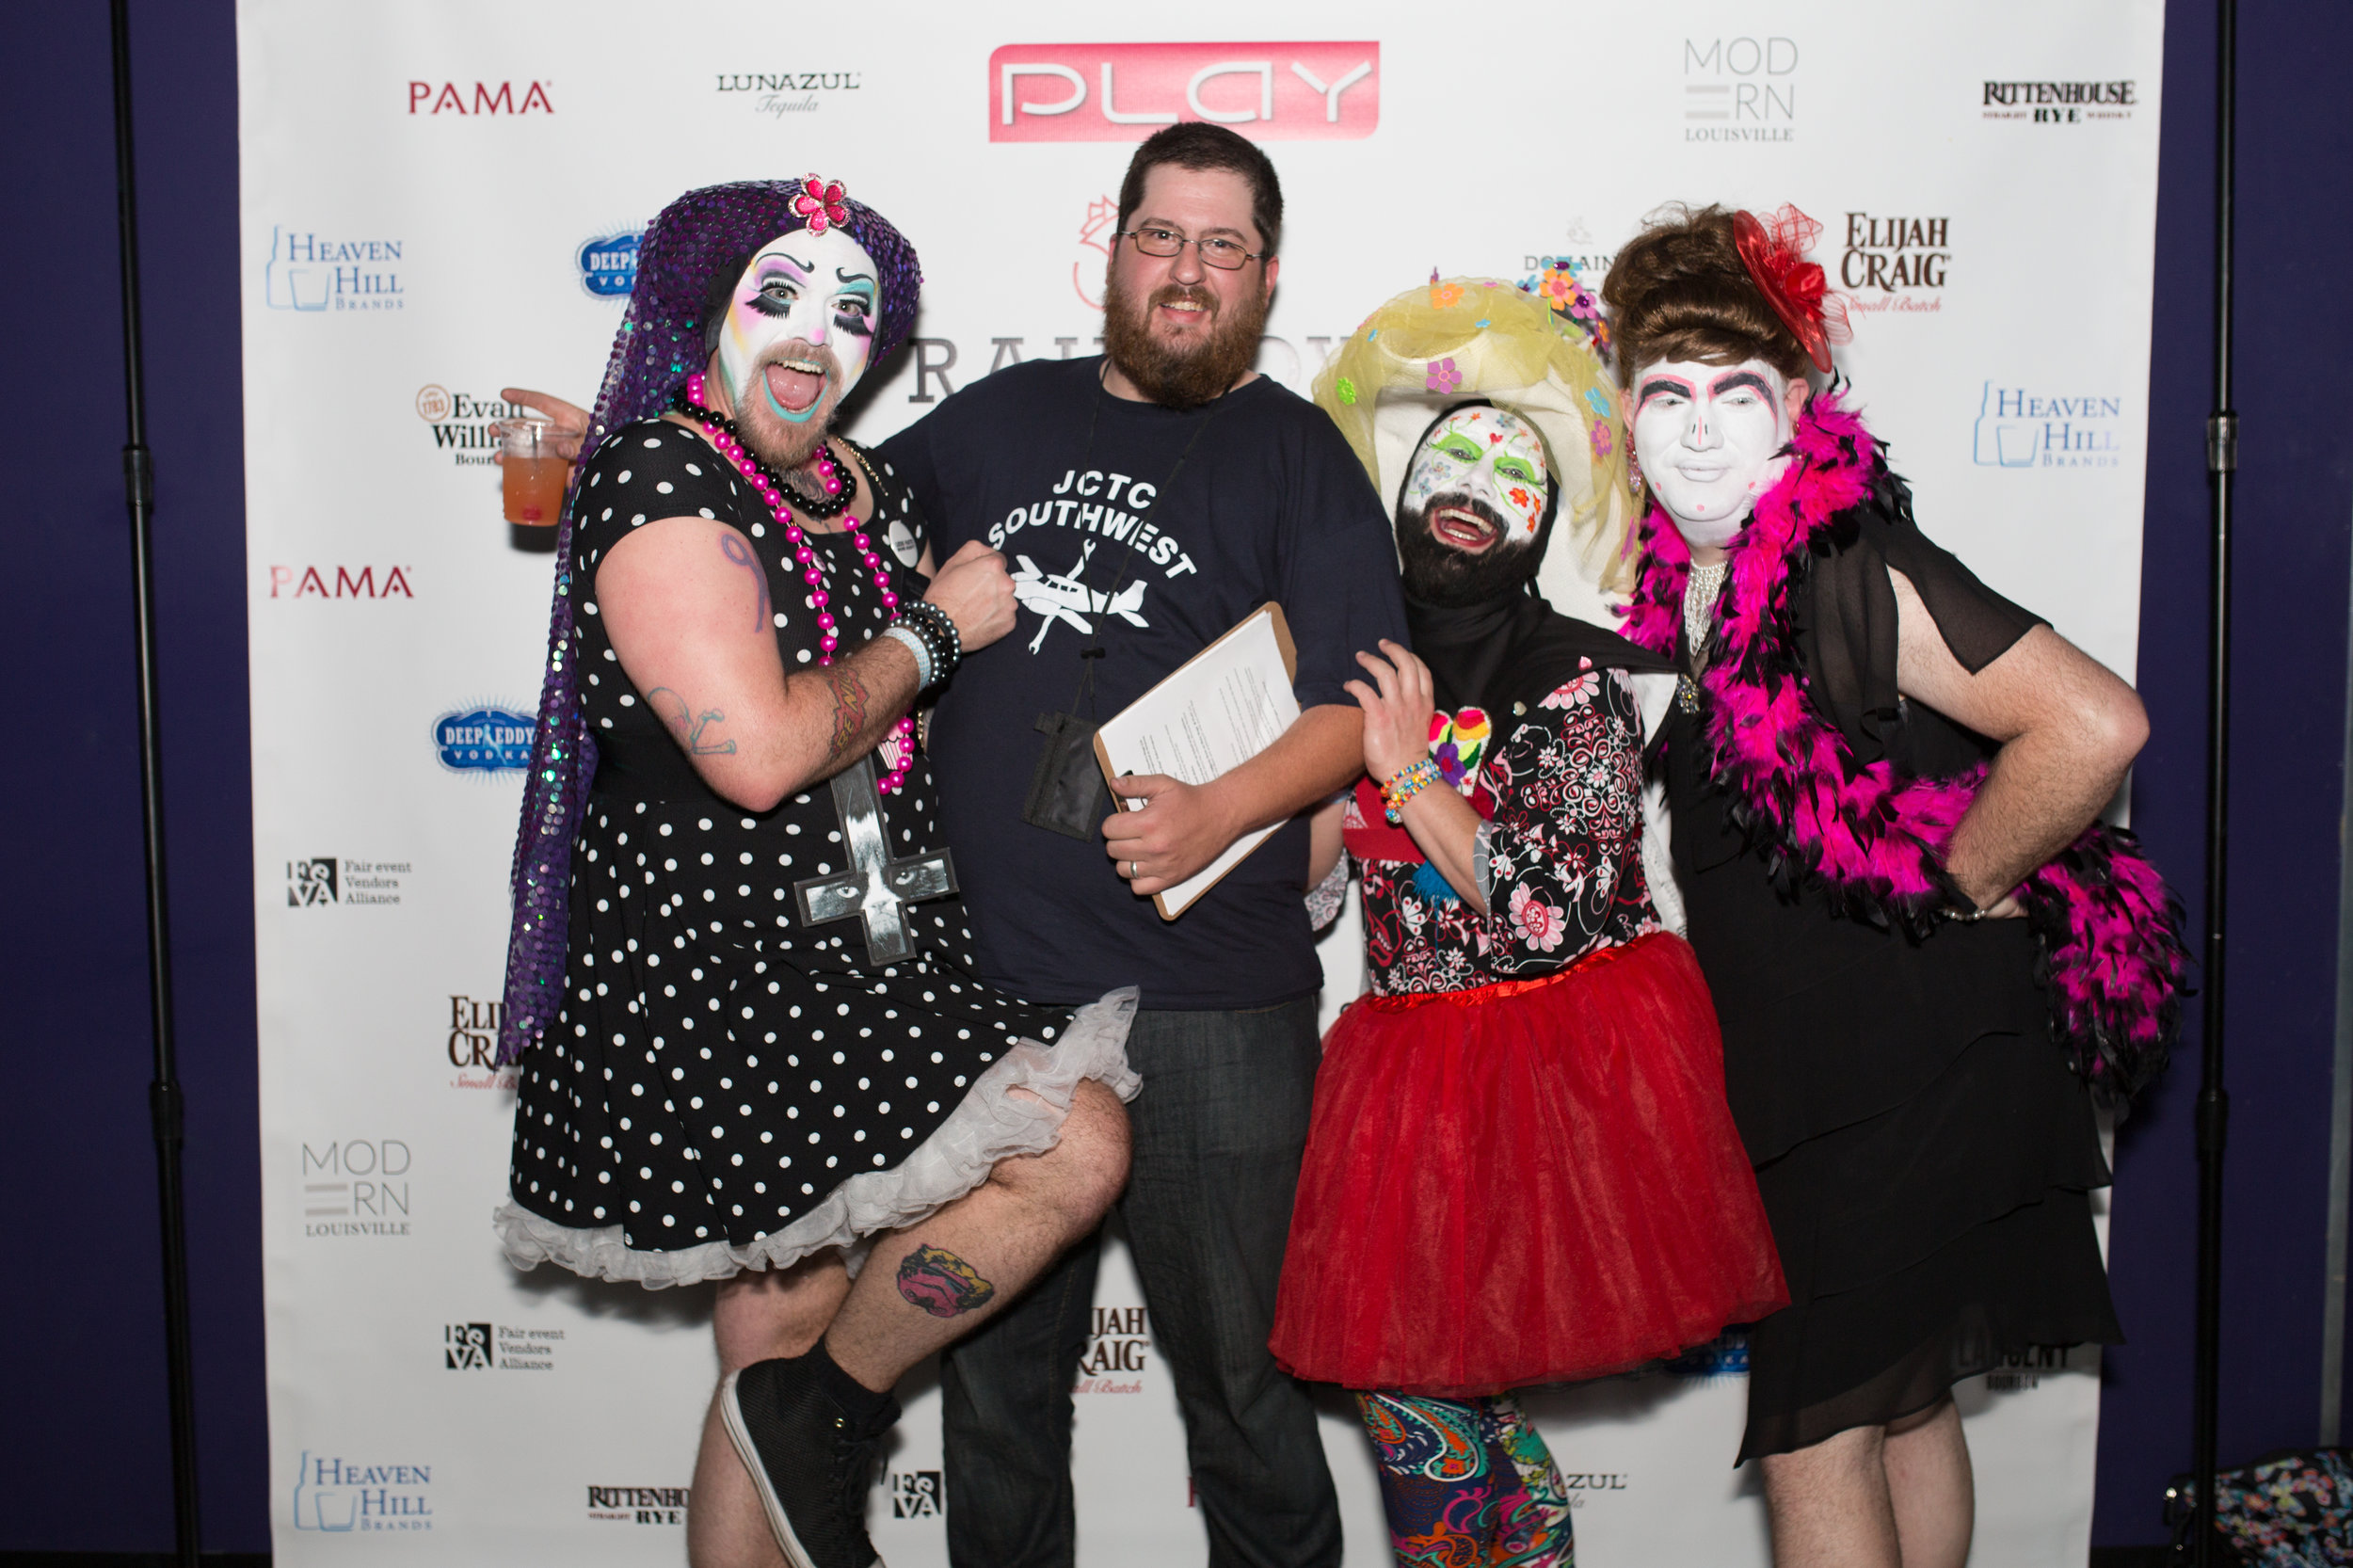 Rainbows & Roses Thurby 2017 WEBSITE FEVA PLAY Crystal Ludwick Photo 22.jpg